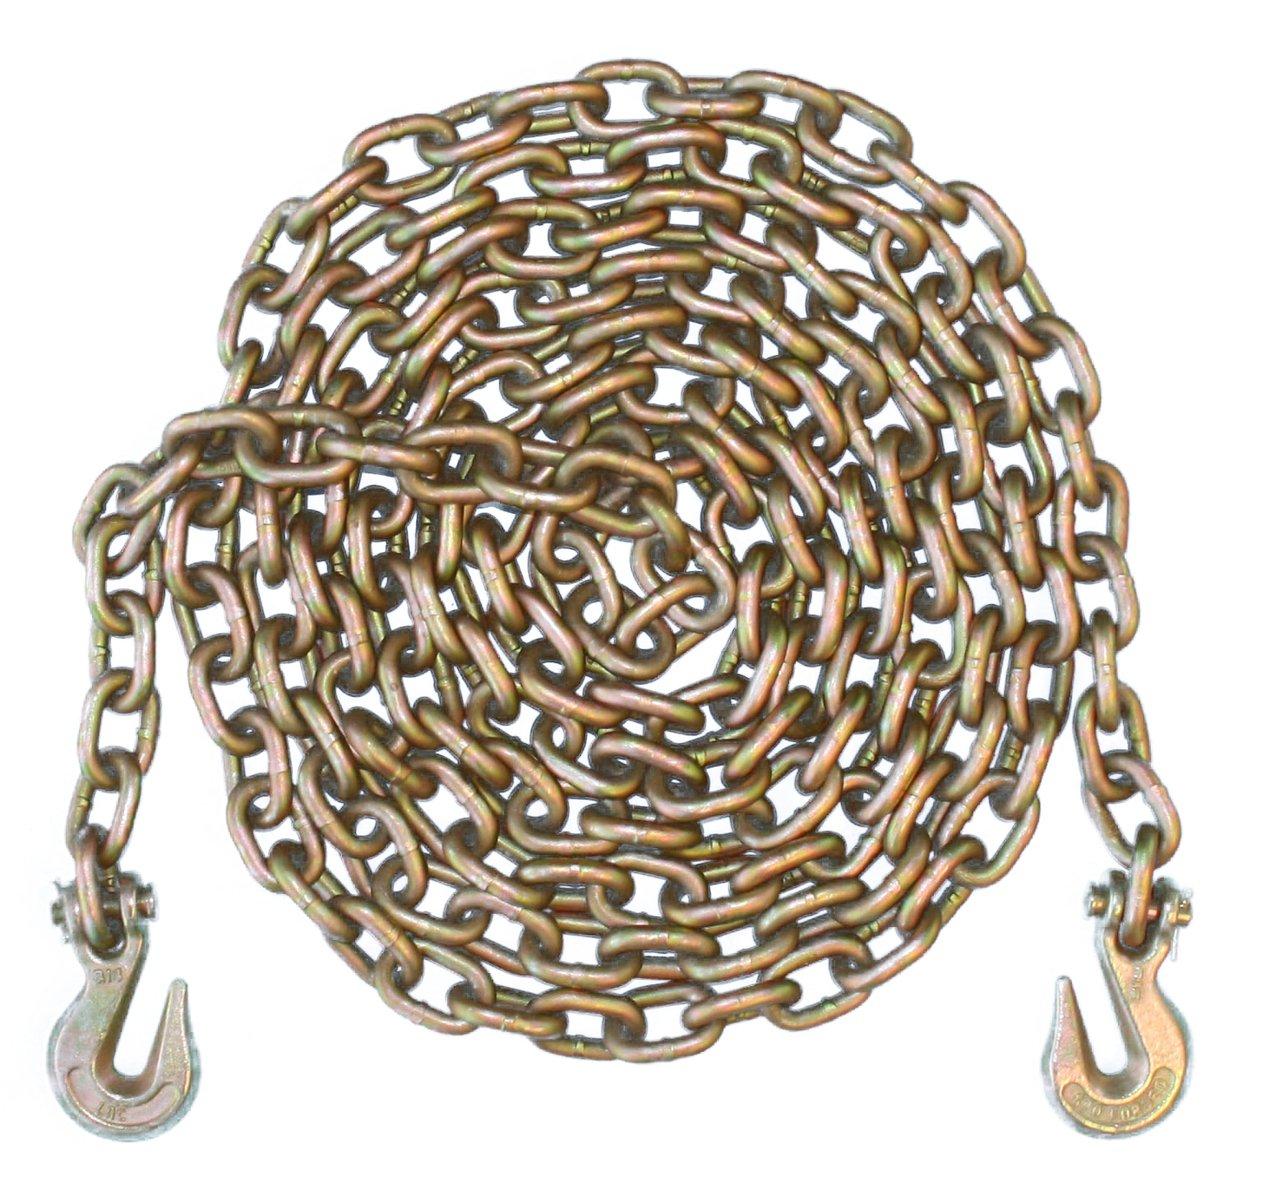 1/2'' - Grade 70 Binder Chain - Grab Hooks - 10' Length